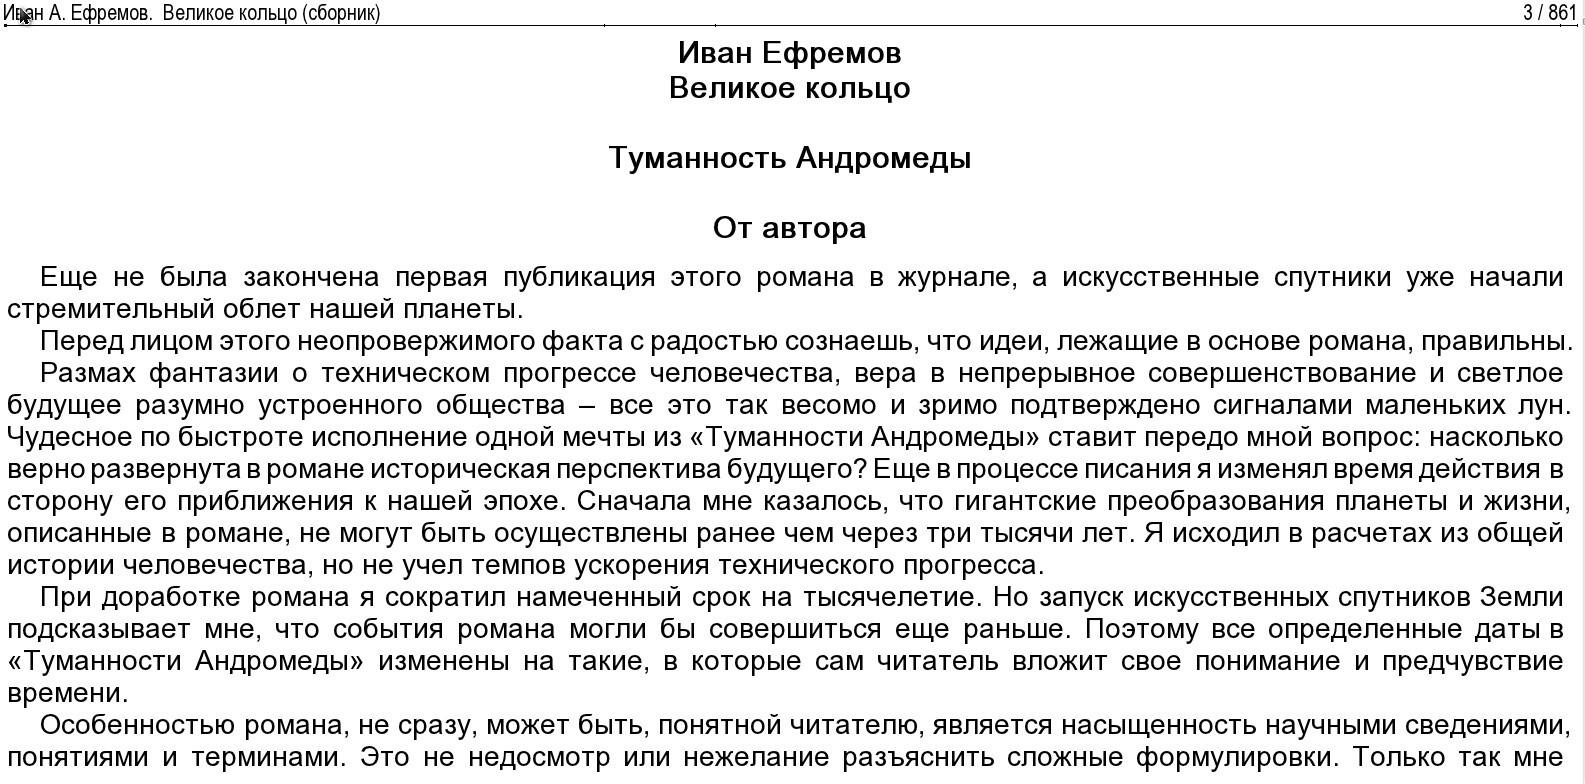 http://i1.imageban.ru/out/2014/08/11/43caa7a49498e13b4060ca90fdb41761.jpg